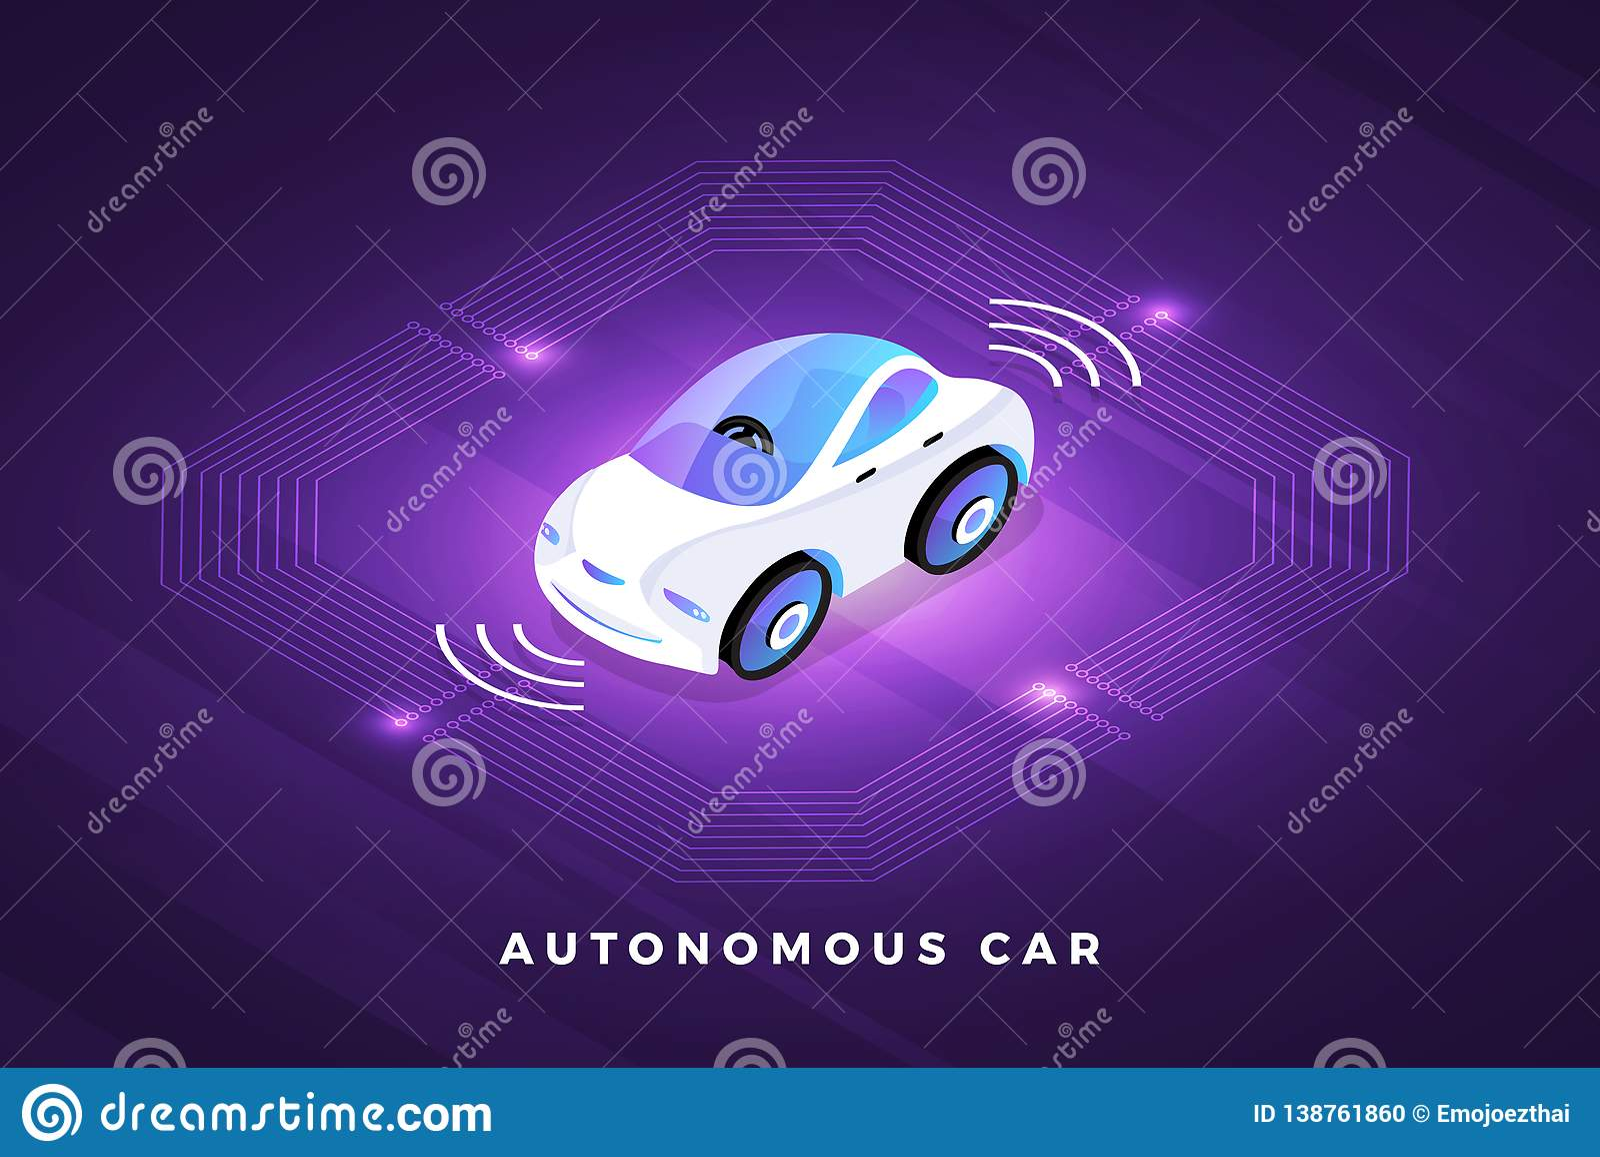 Autonomous Car Conceept stock vector  Illustration of data